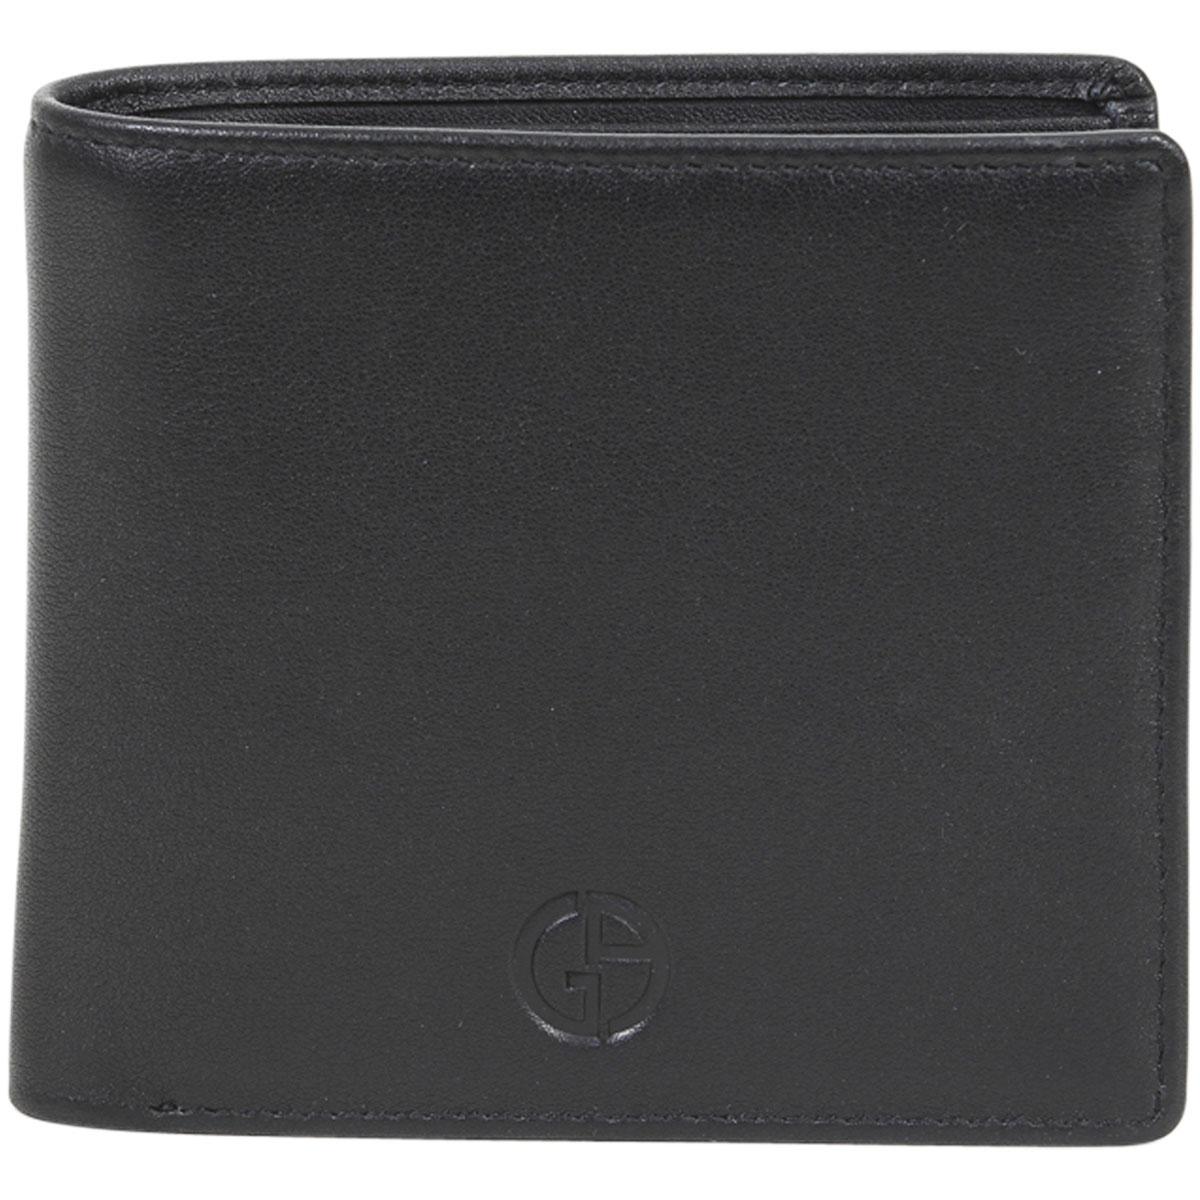 Image of Giorgio Armani Men's Genuine Leather Bi Fold Wallet - Black